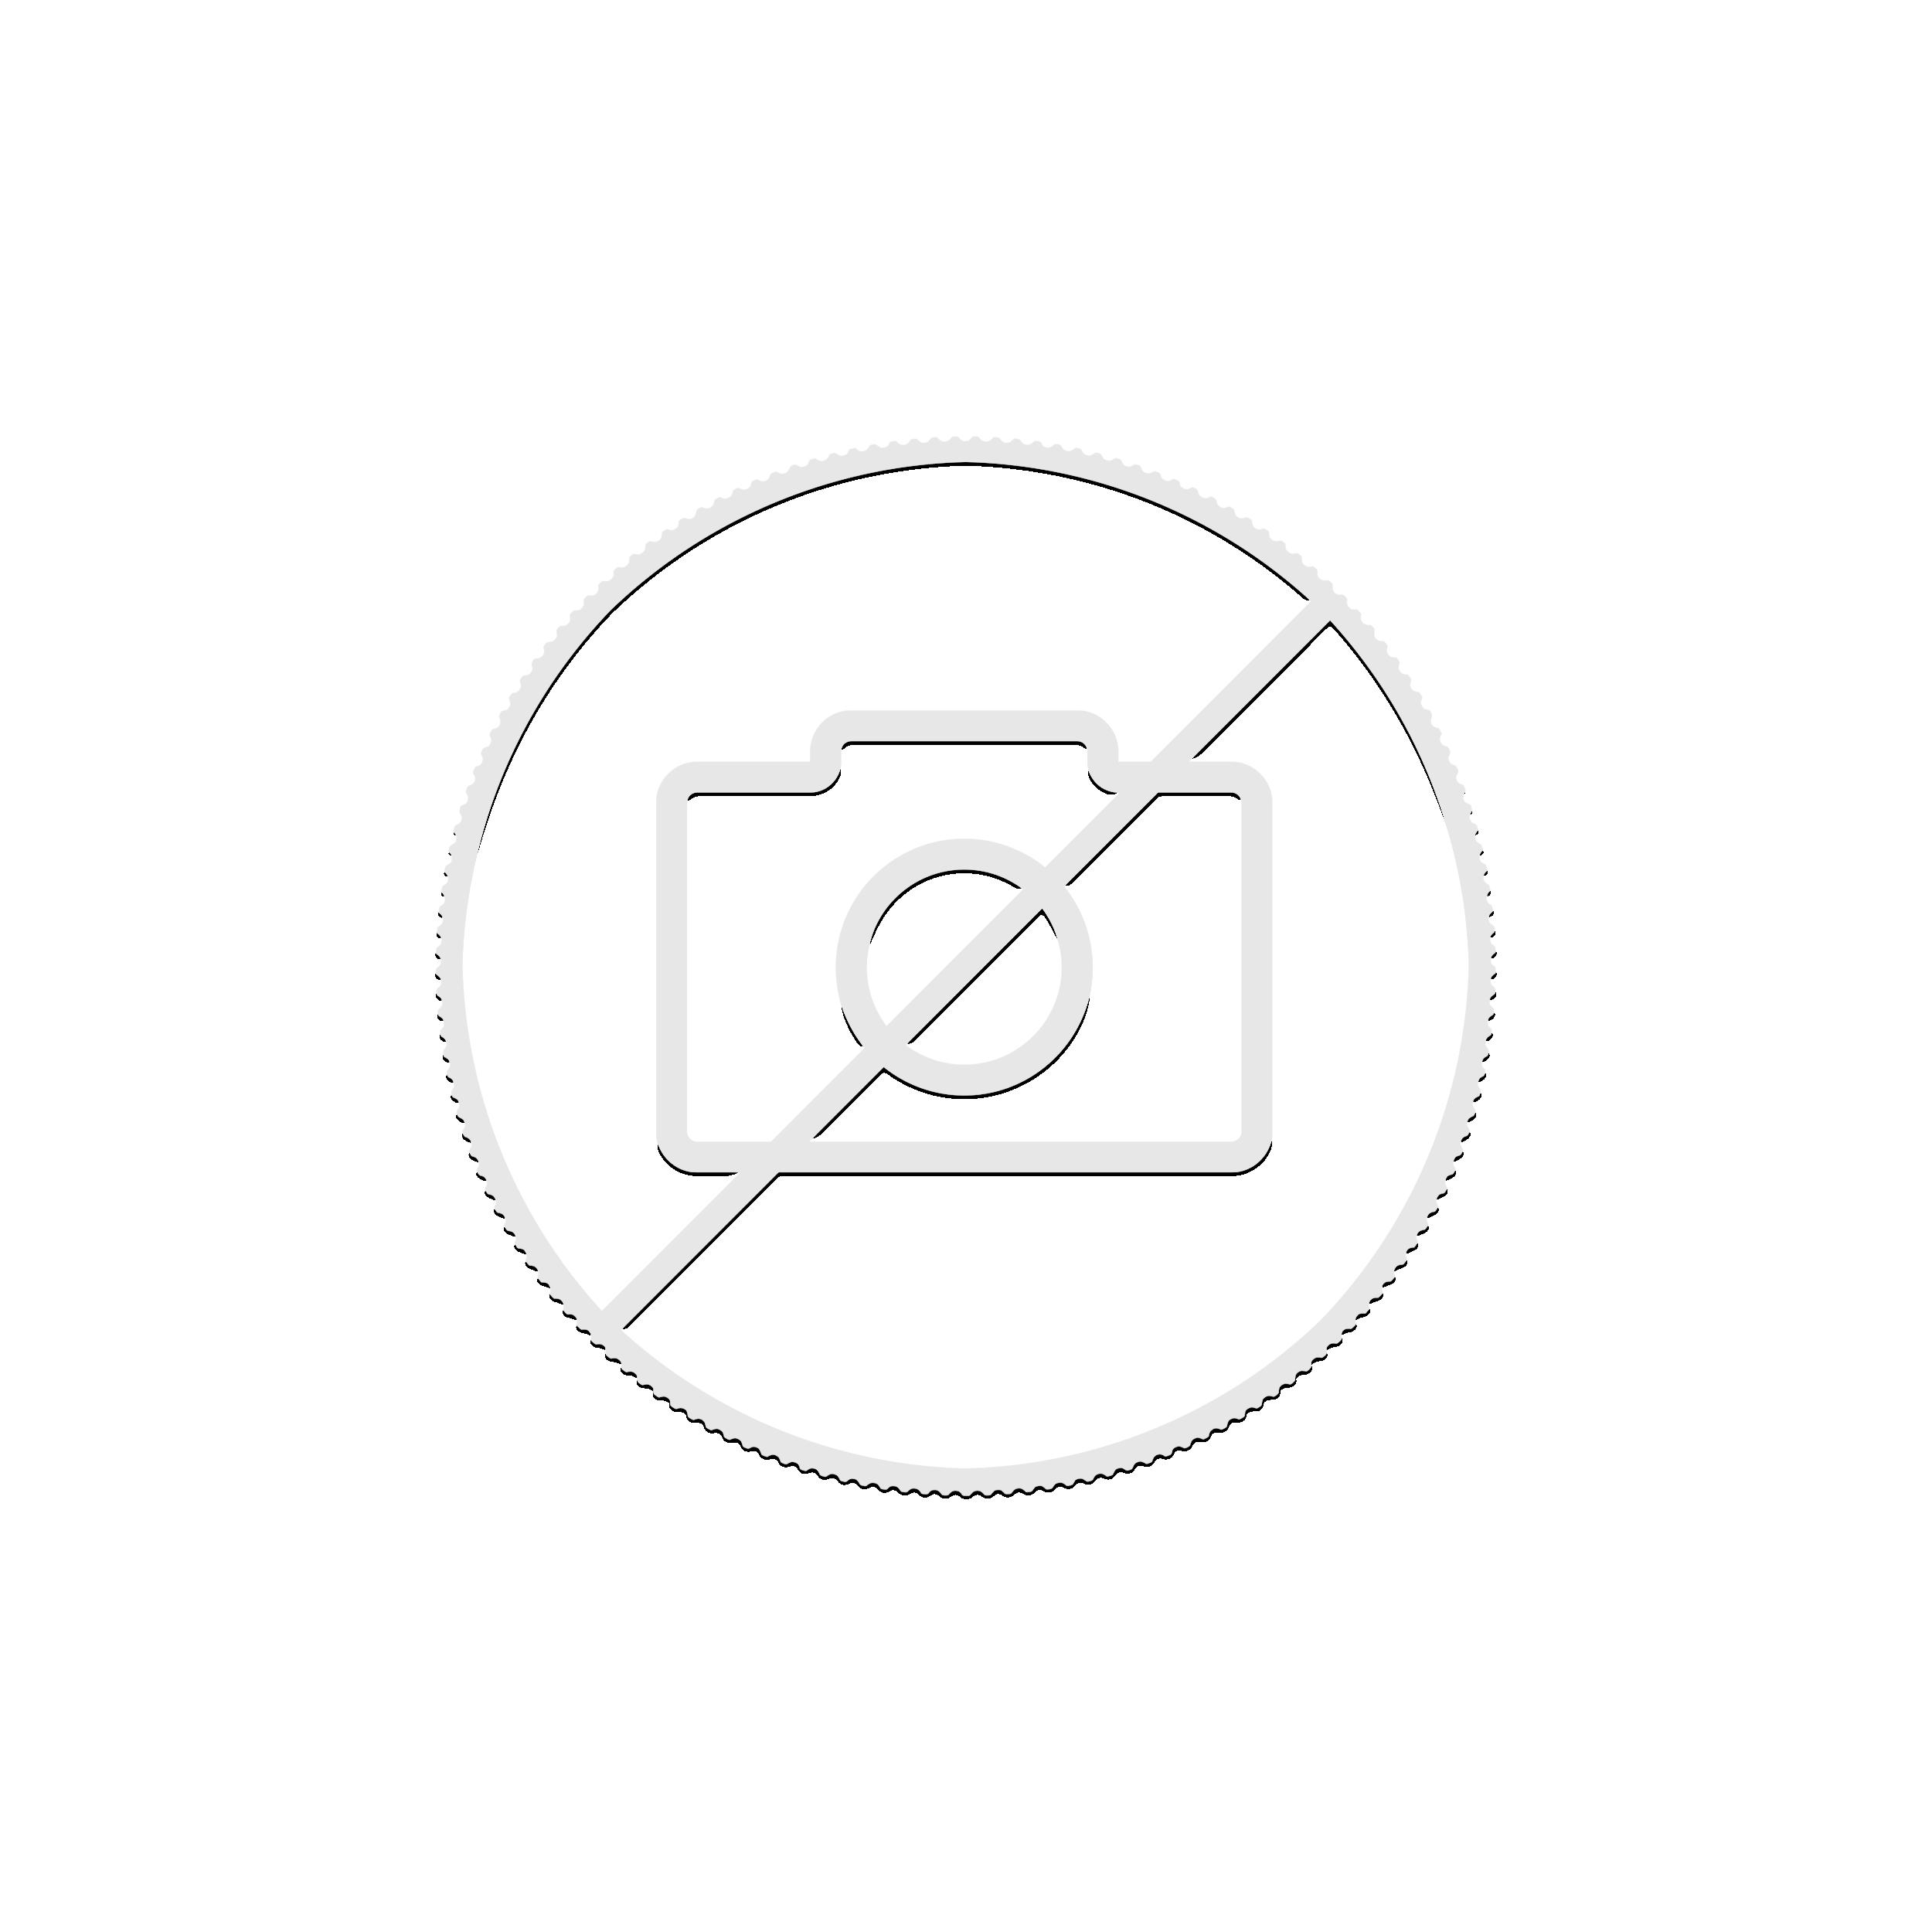 3 Troy ounce zilveren munt Maple Leaf 40th Anniversary 2019 Proof achterzijde